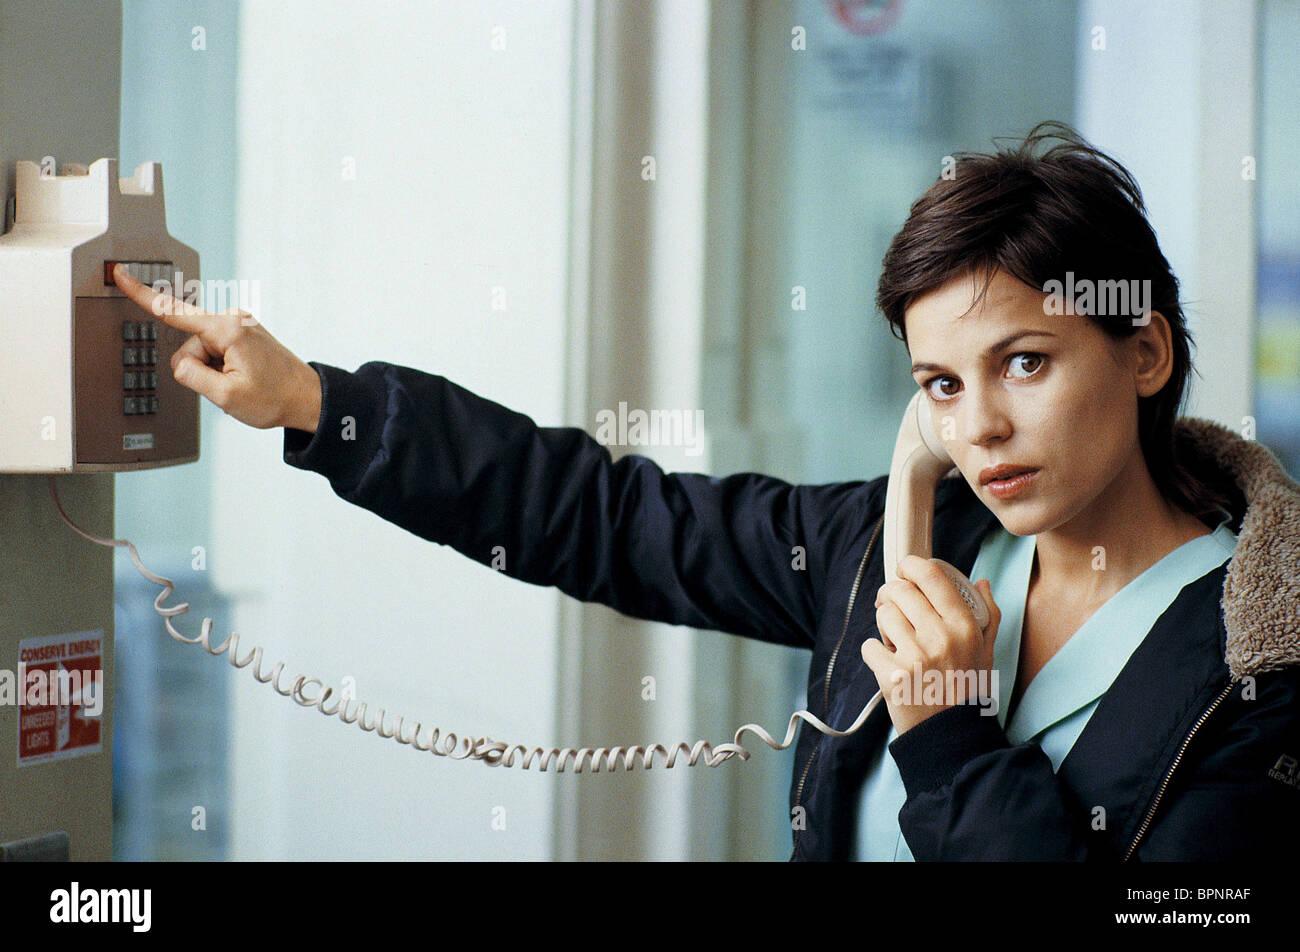 ELENA ANAYA FRAGILE (2005) - Stock Image